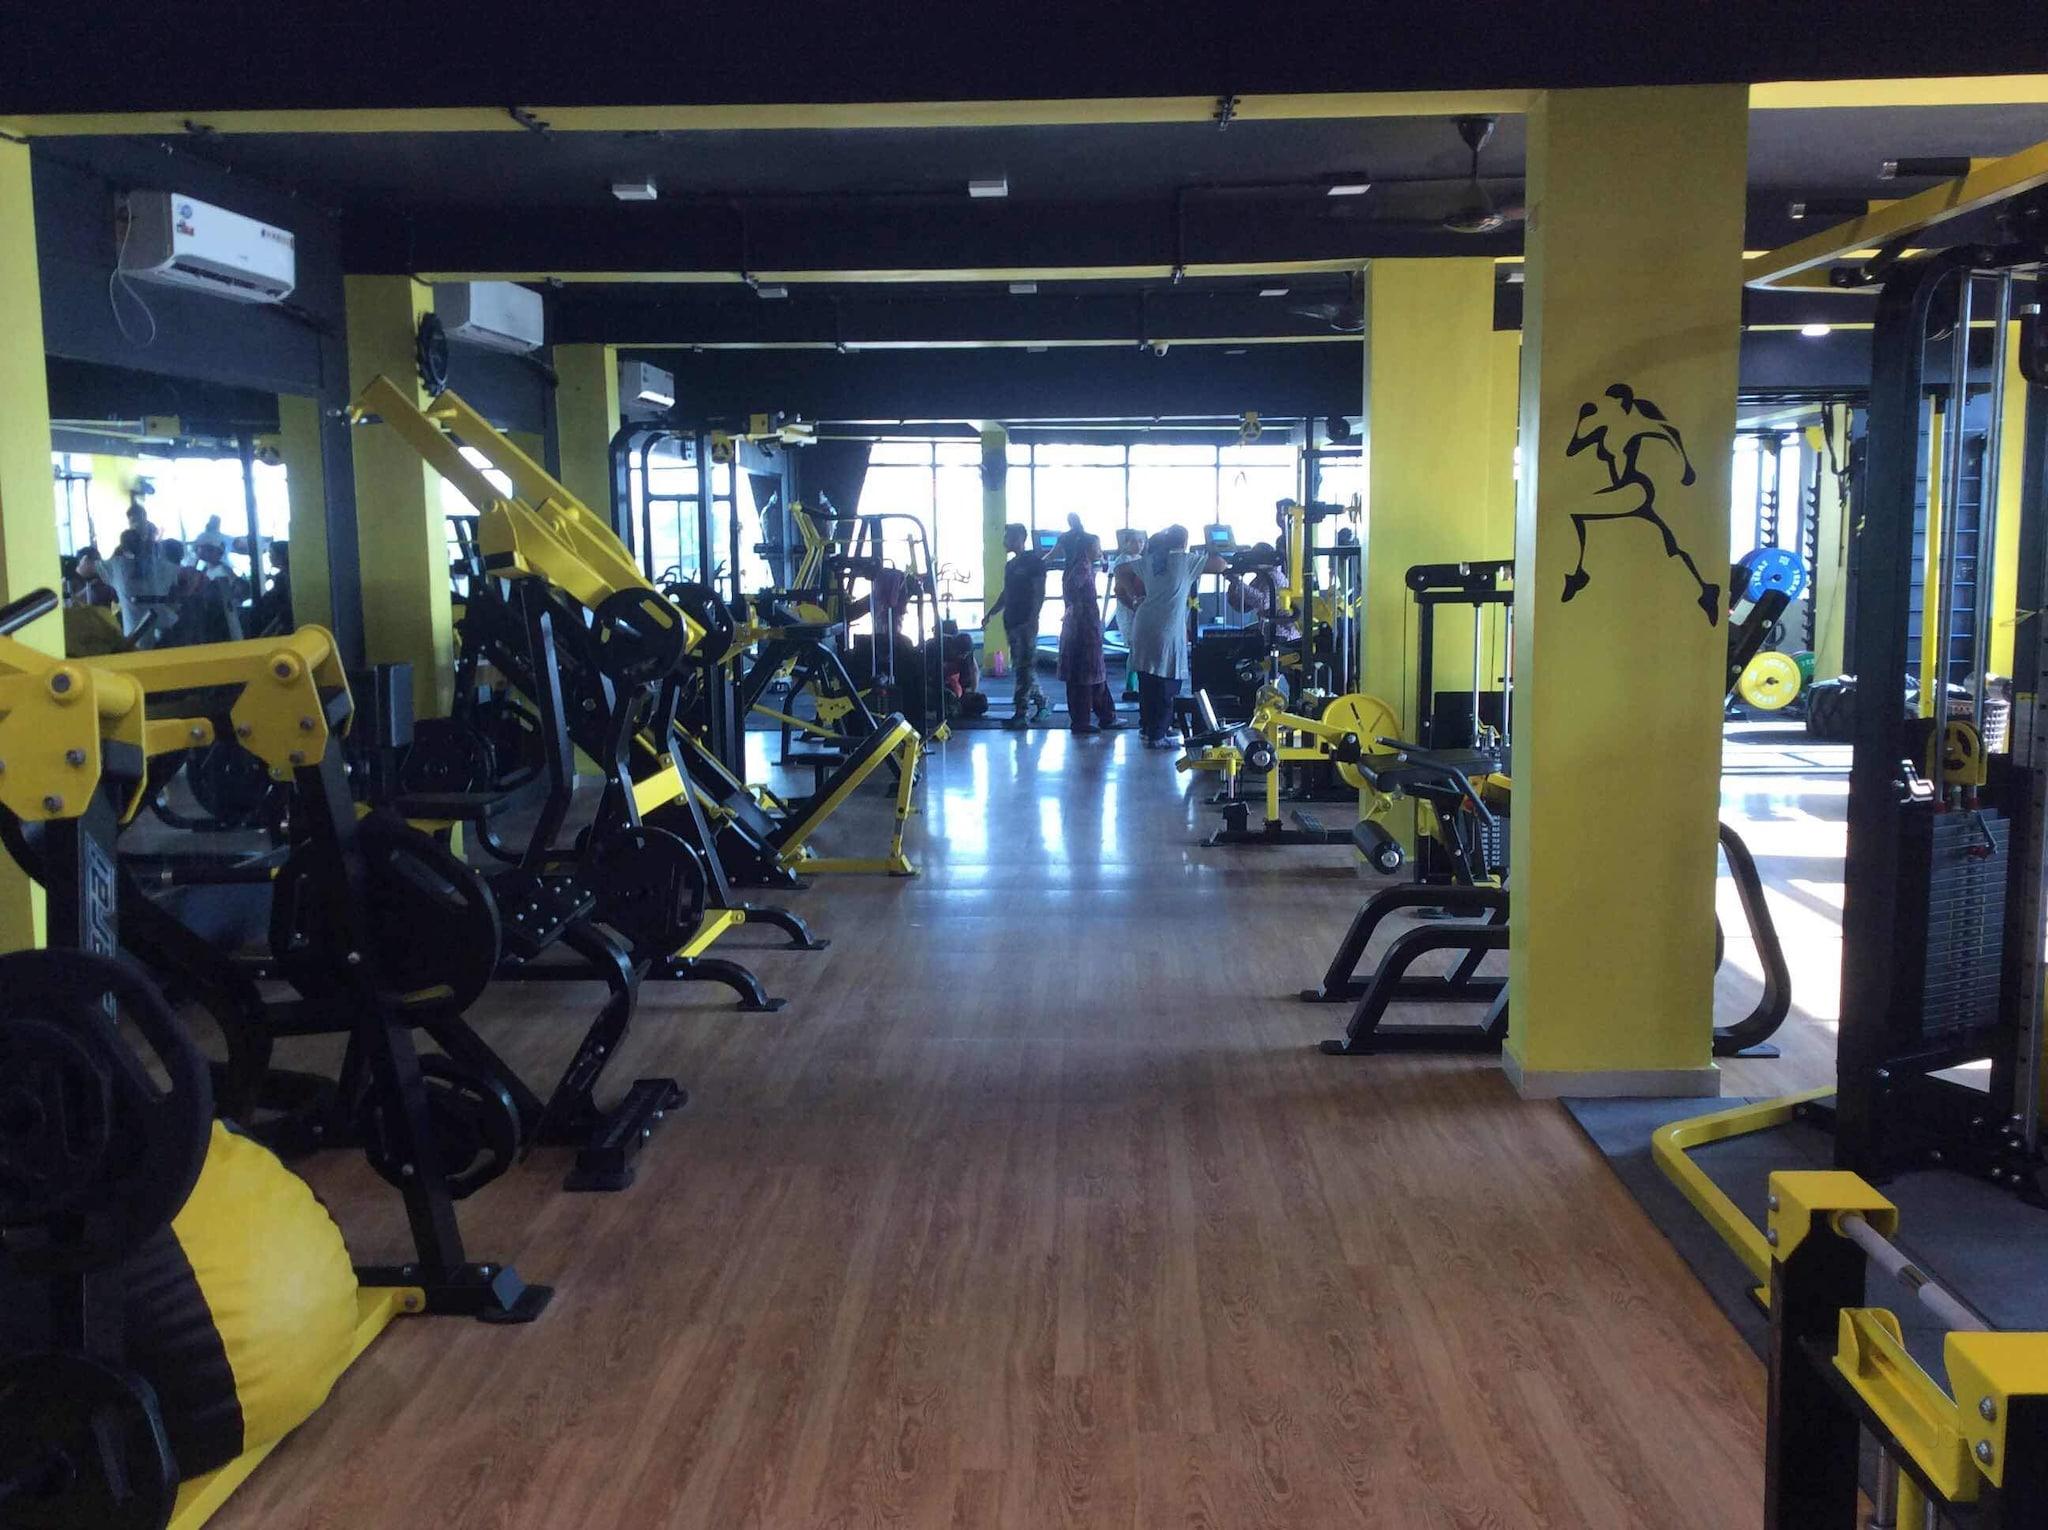 Top crossfit gyms in surat best crossfit classes justdial